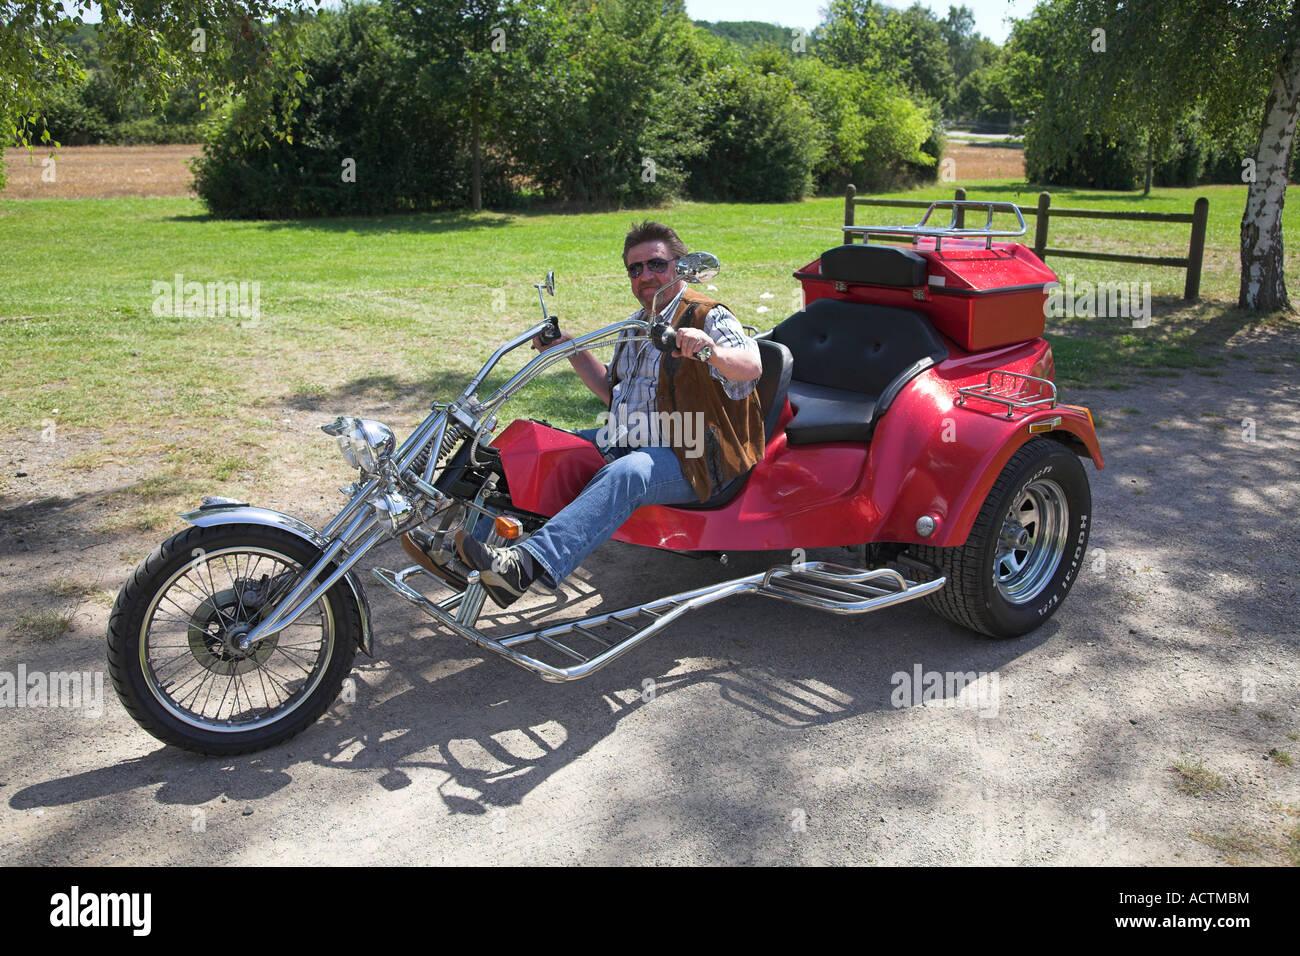 A three-wheel motorcycle. - Stock Image